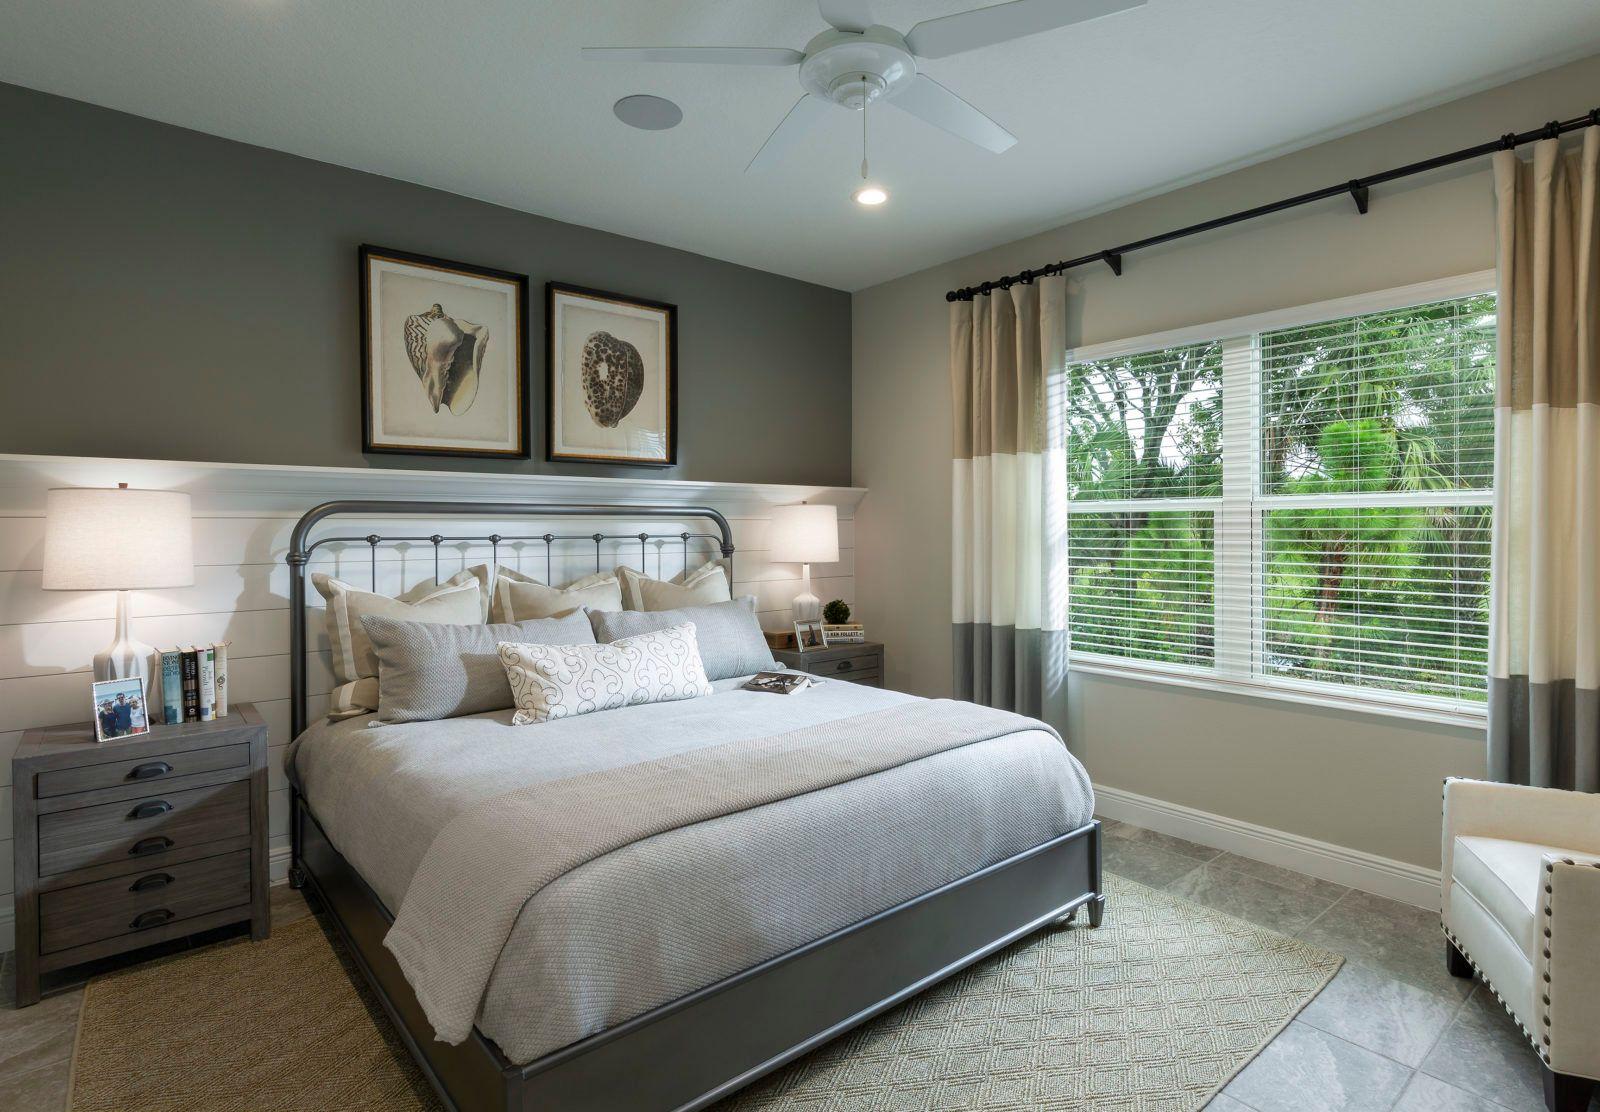 Bedroom featured in the Tidewater By Neal Communities in Sarasota-Bradenton, FL